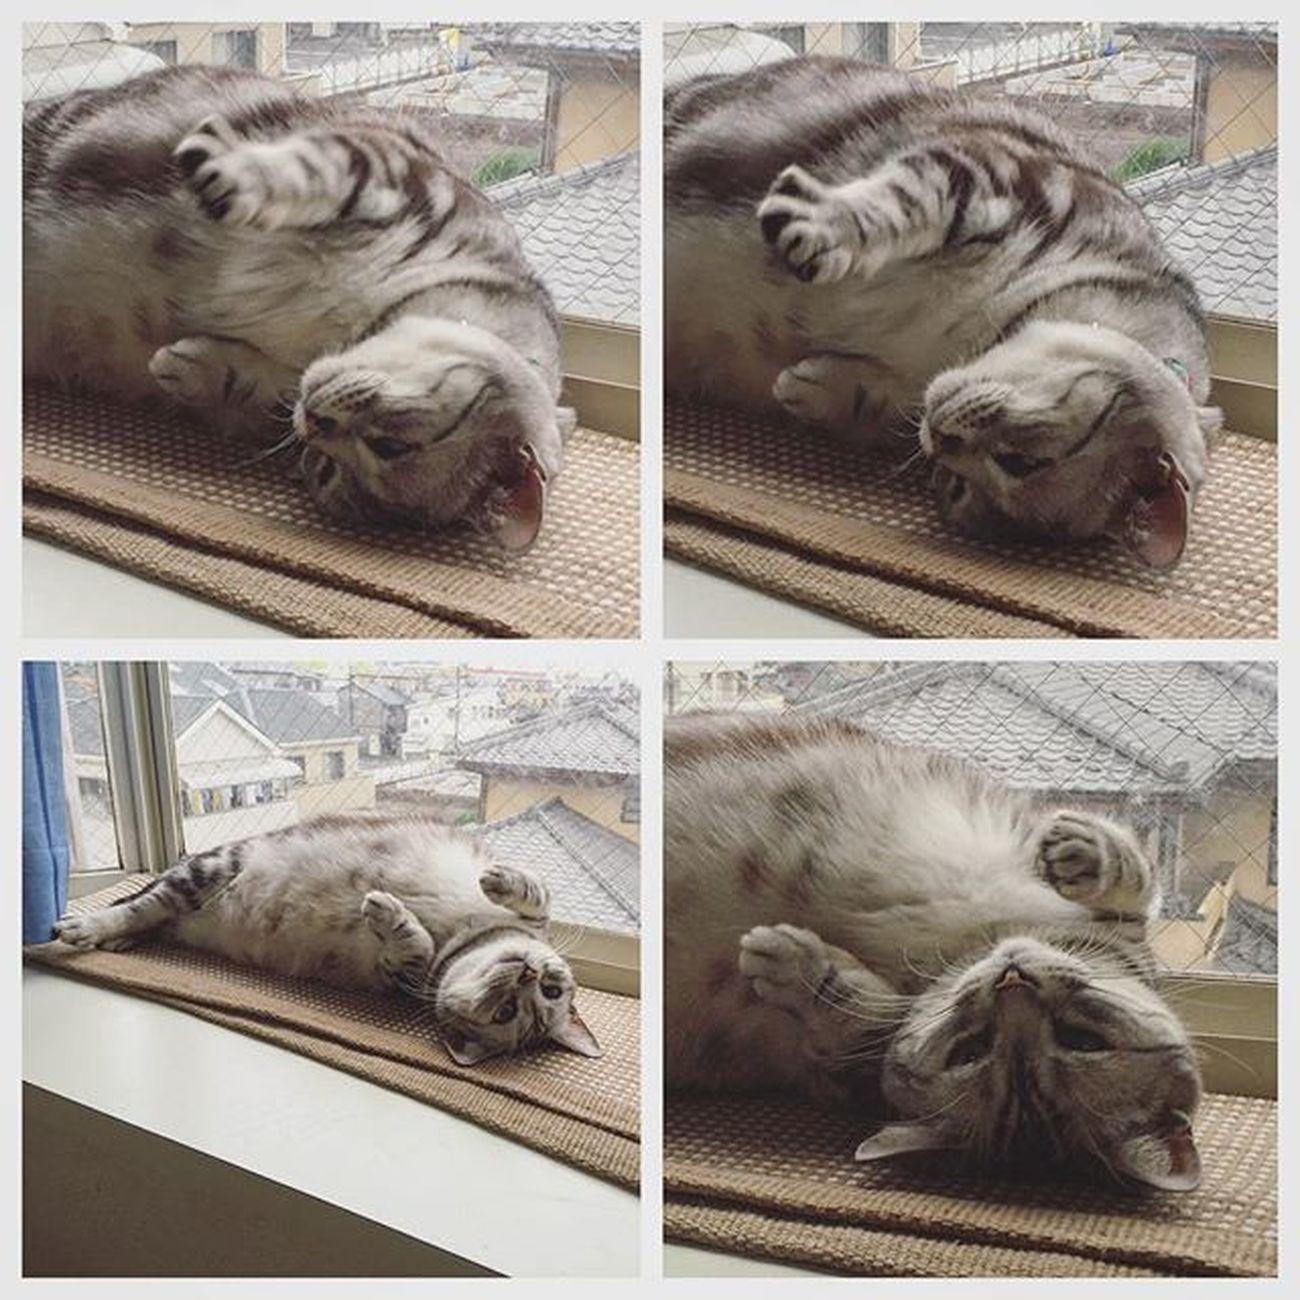 Cat Neko ねこ 猫 ねこ Cats アメリカンショートヘアー アメショ Americanshorthair ズズ ズズ子 Zuzu ズズっぺ シルバータビー ギュルゴロ ゴマフアザラシ こないだのギュルゴロズズだけど…ちょっとした手の開き具合とかたまらんとですよ😚😽💕ゴマフアザラシみたいだけどね…💦